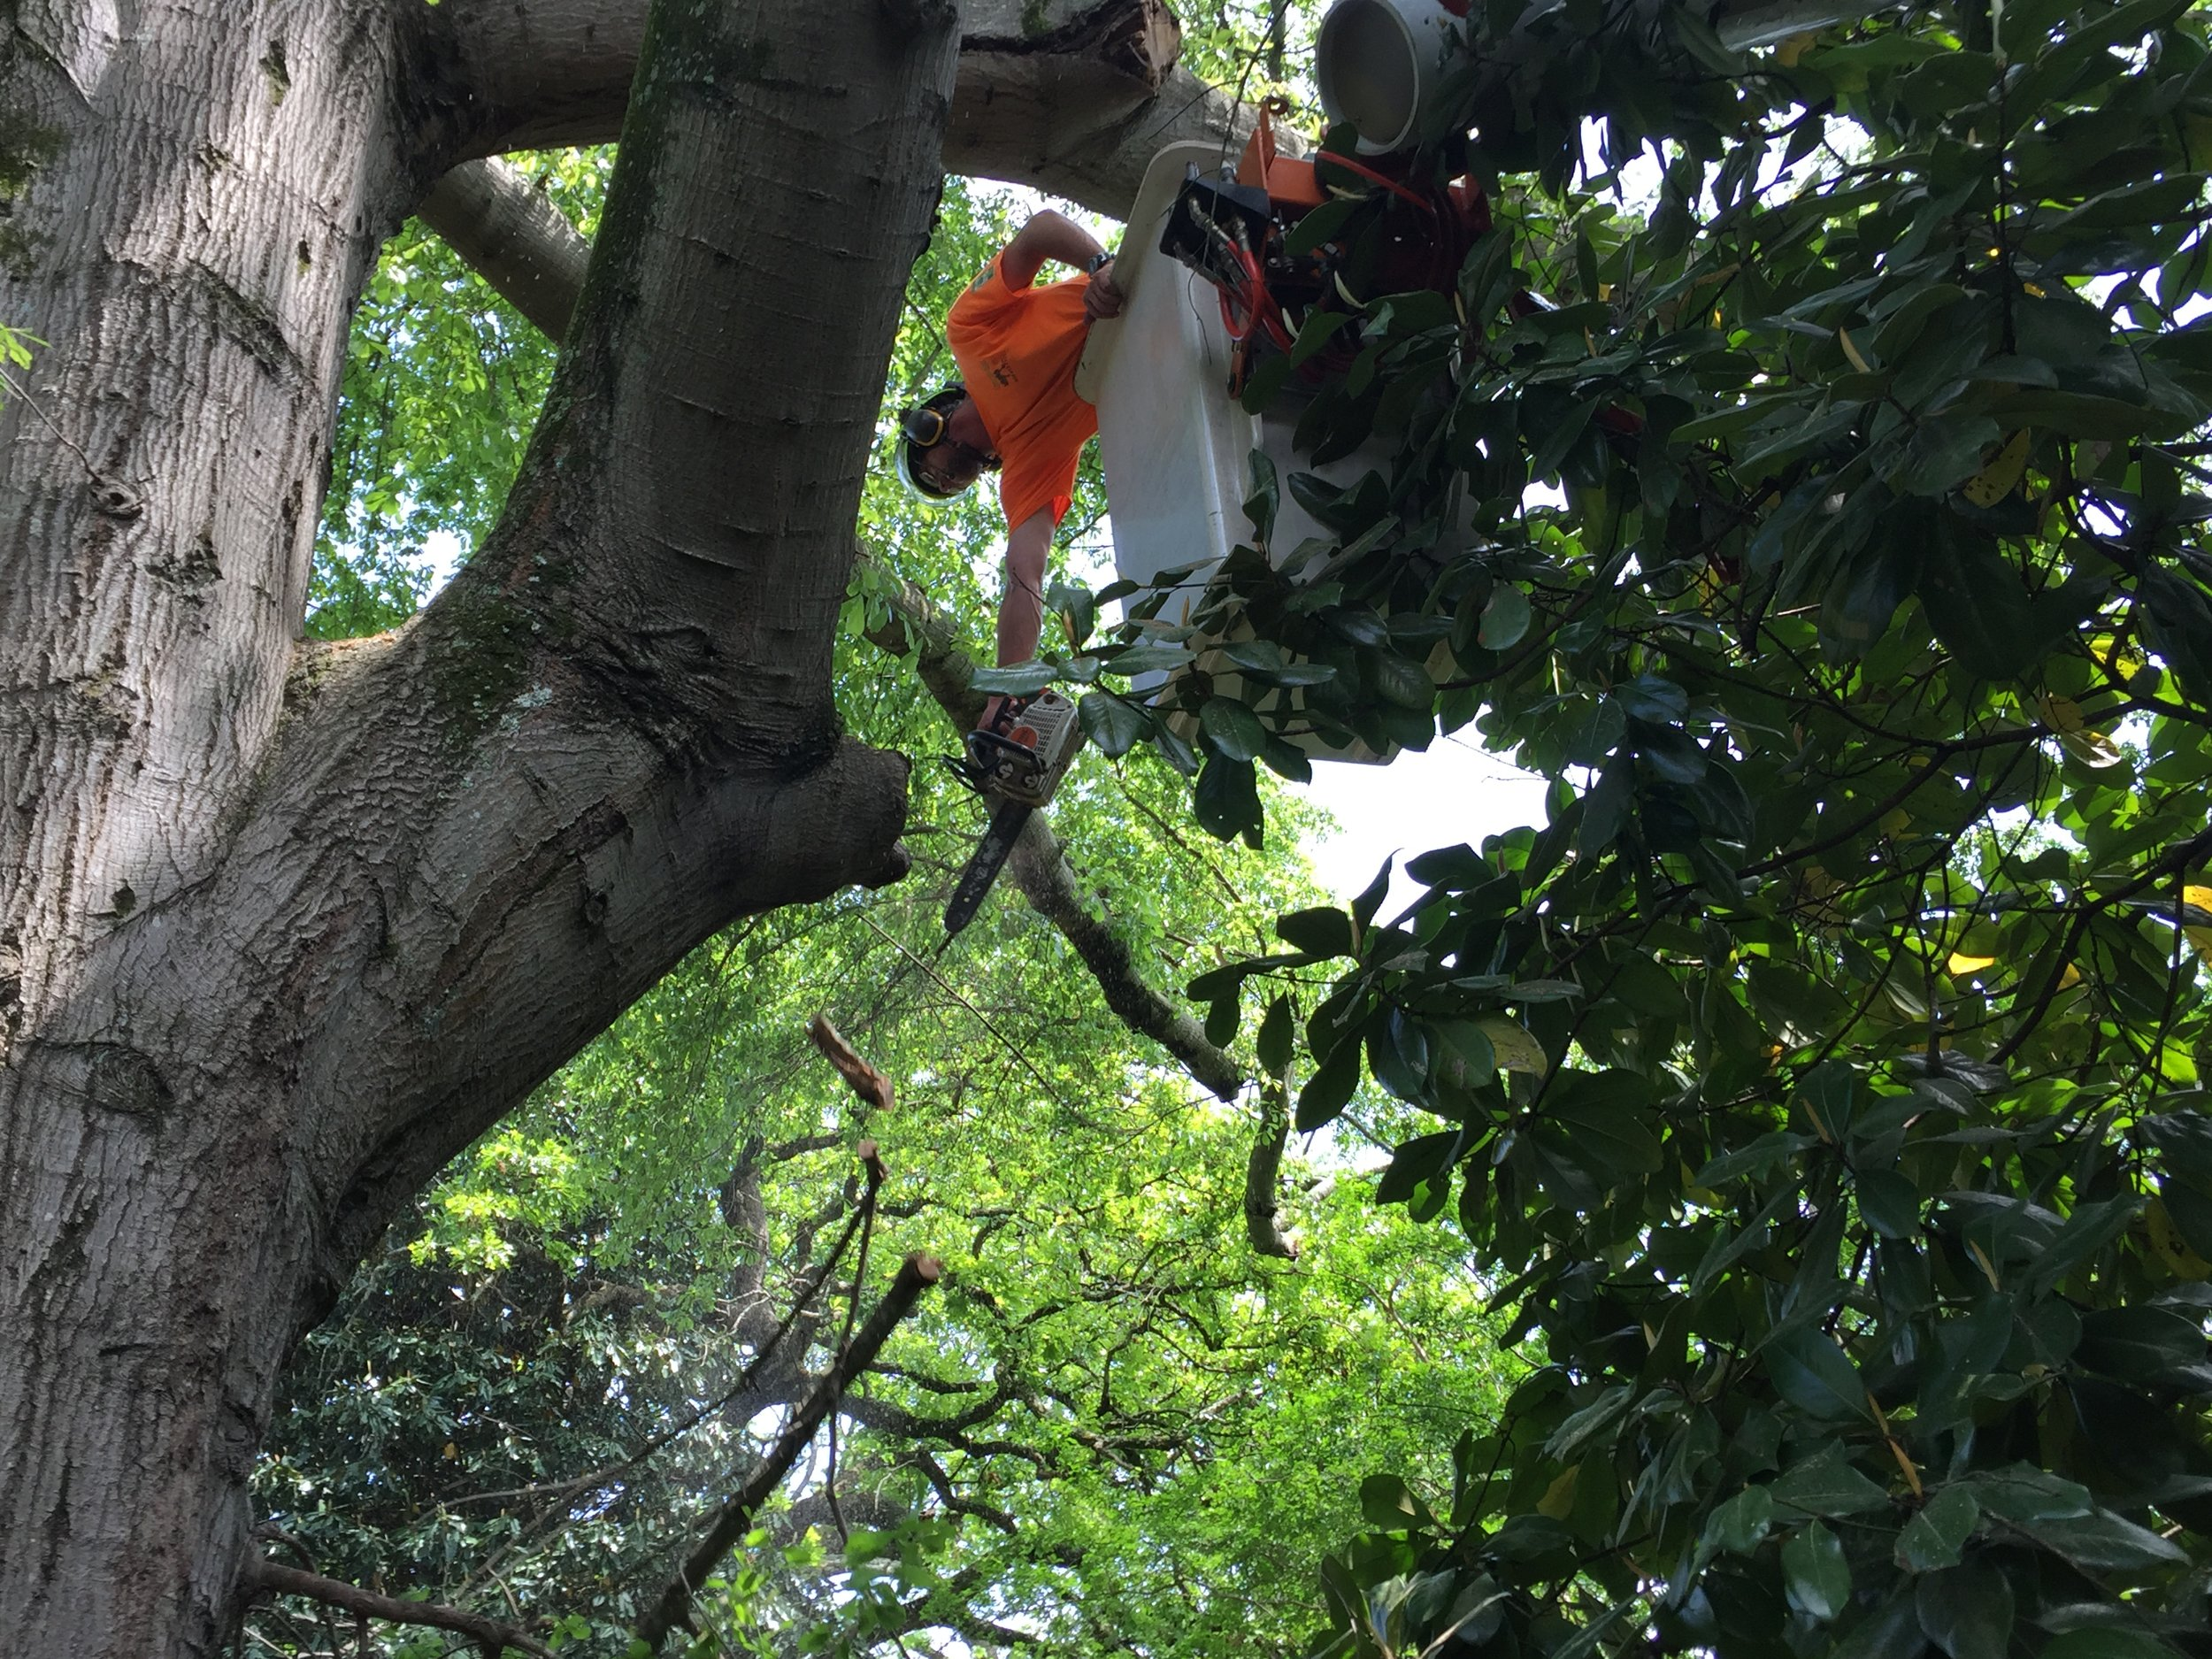 Limbwalkers Tree & Crane Service deadwooding a tree in Morganton, NC.